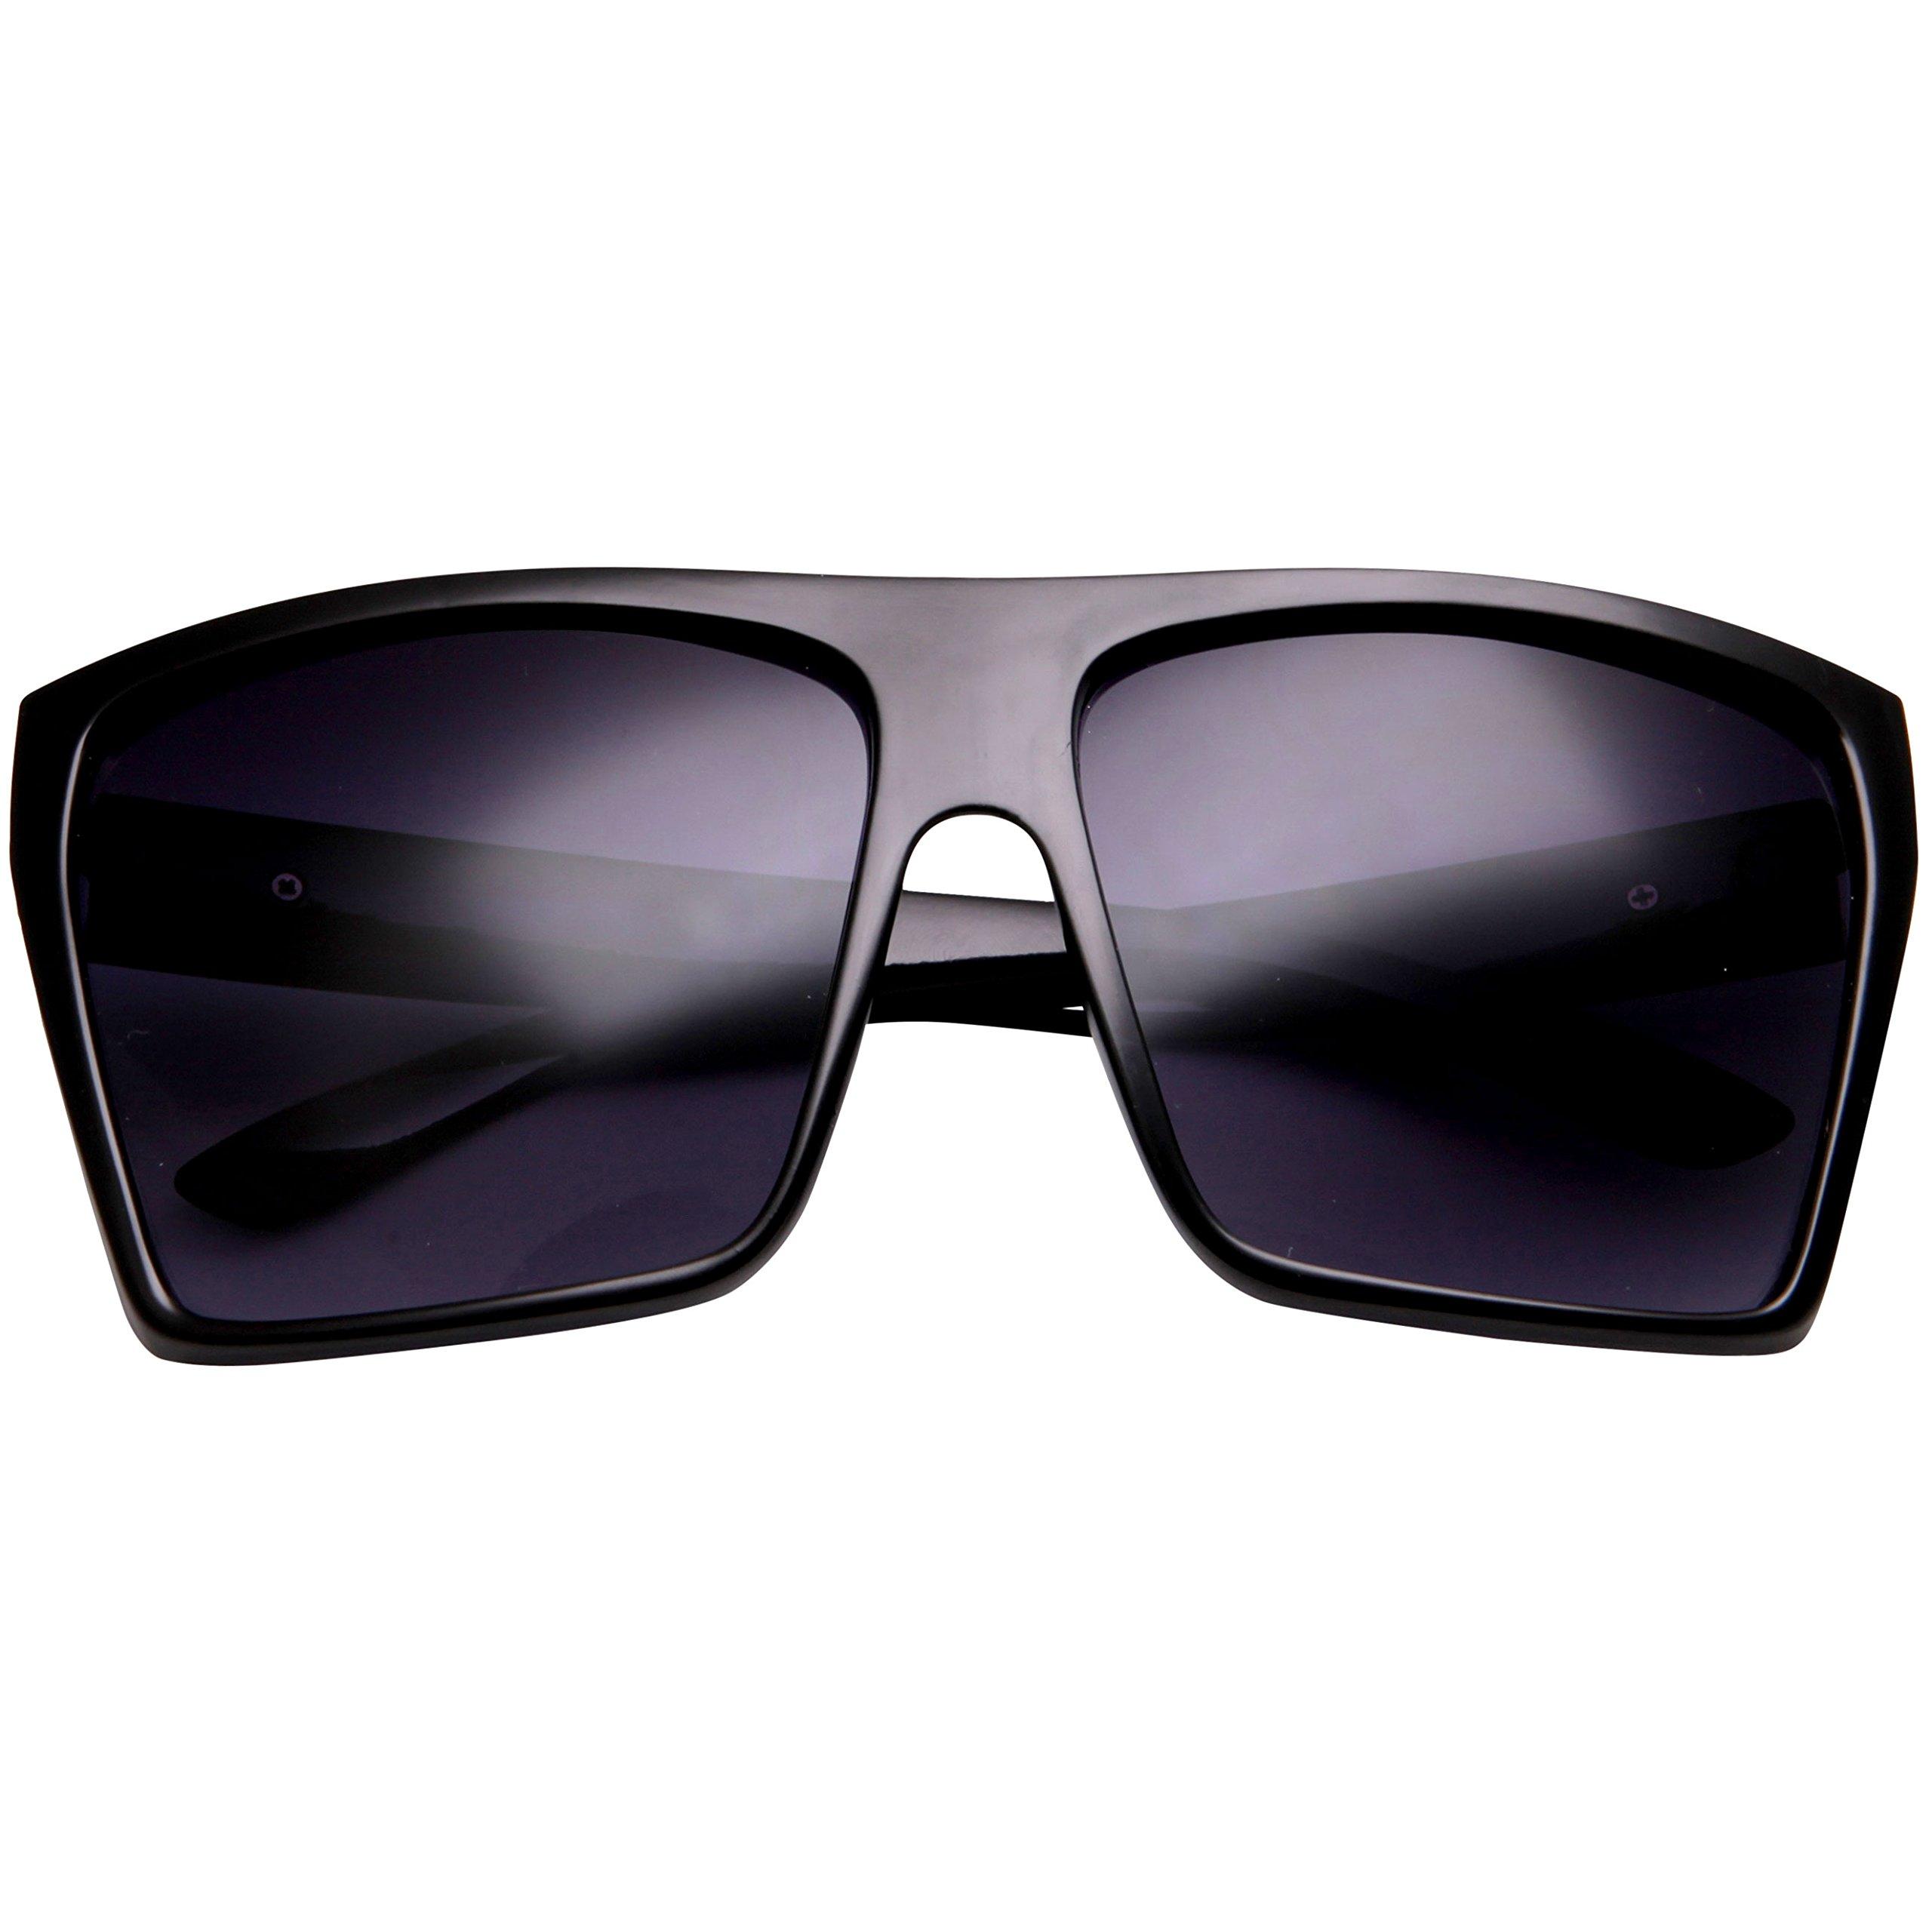 XL Sunglasses for Men Extra Large Retro Style Square Aviator Flat Top Sunglasses Shades